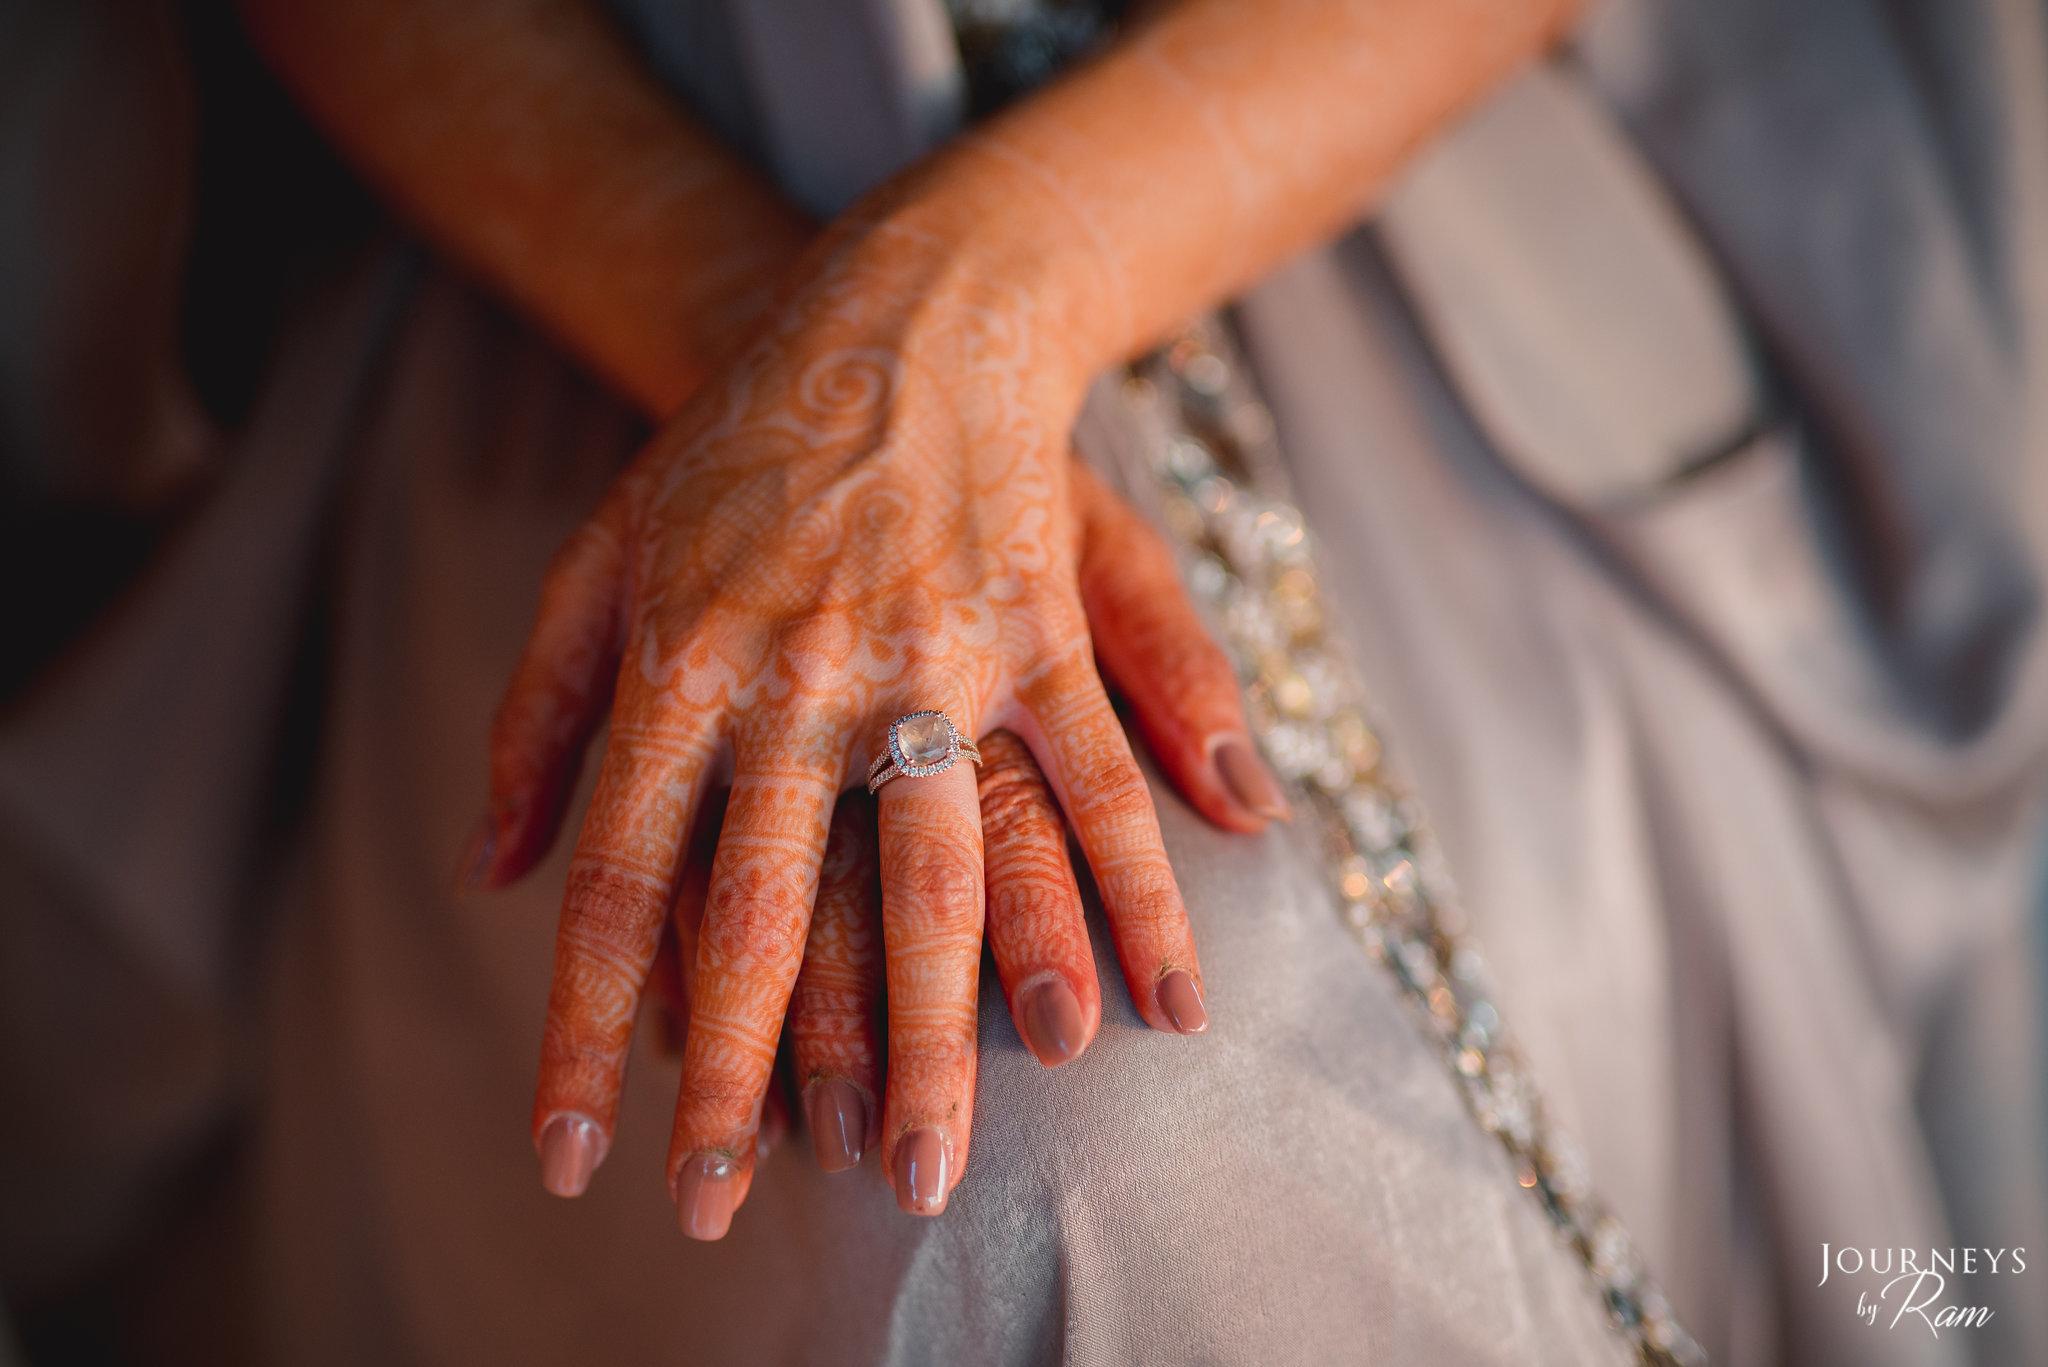 Morganite-rose-gold-engagement-ring.jpg